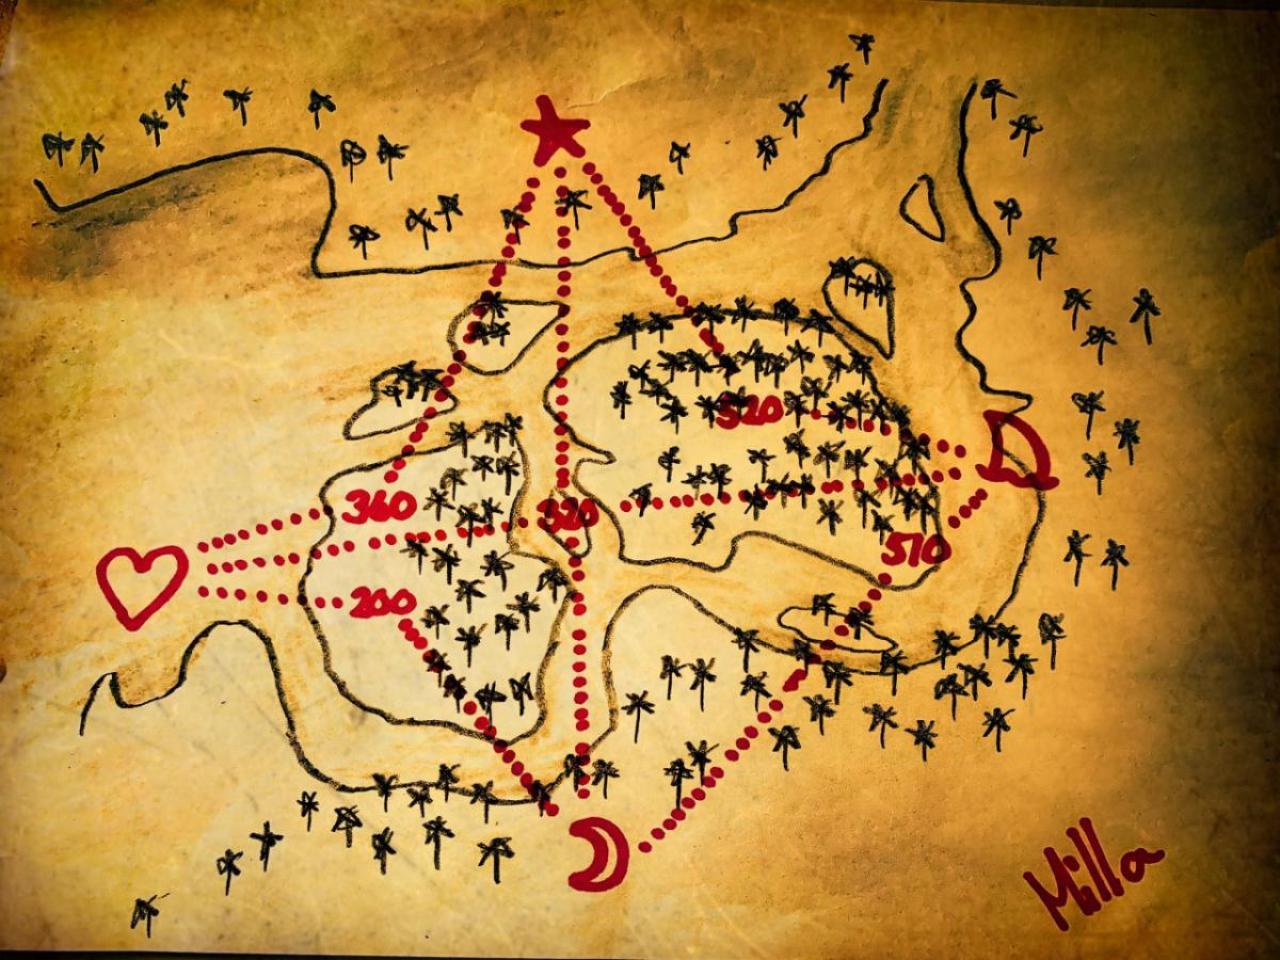 BFV:Solomon Islandsの宝の地図公開!2カ月も見つかっていないイースターエッグの大ヒントが発表